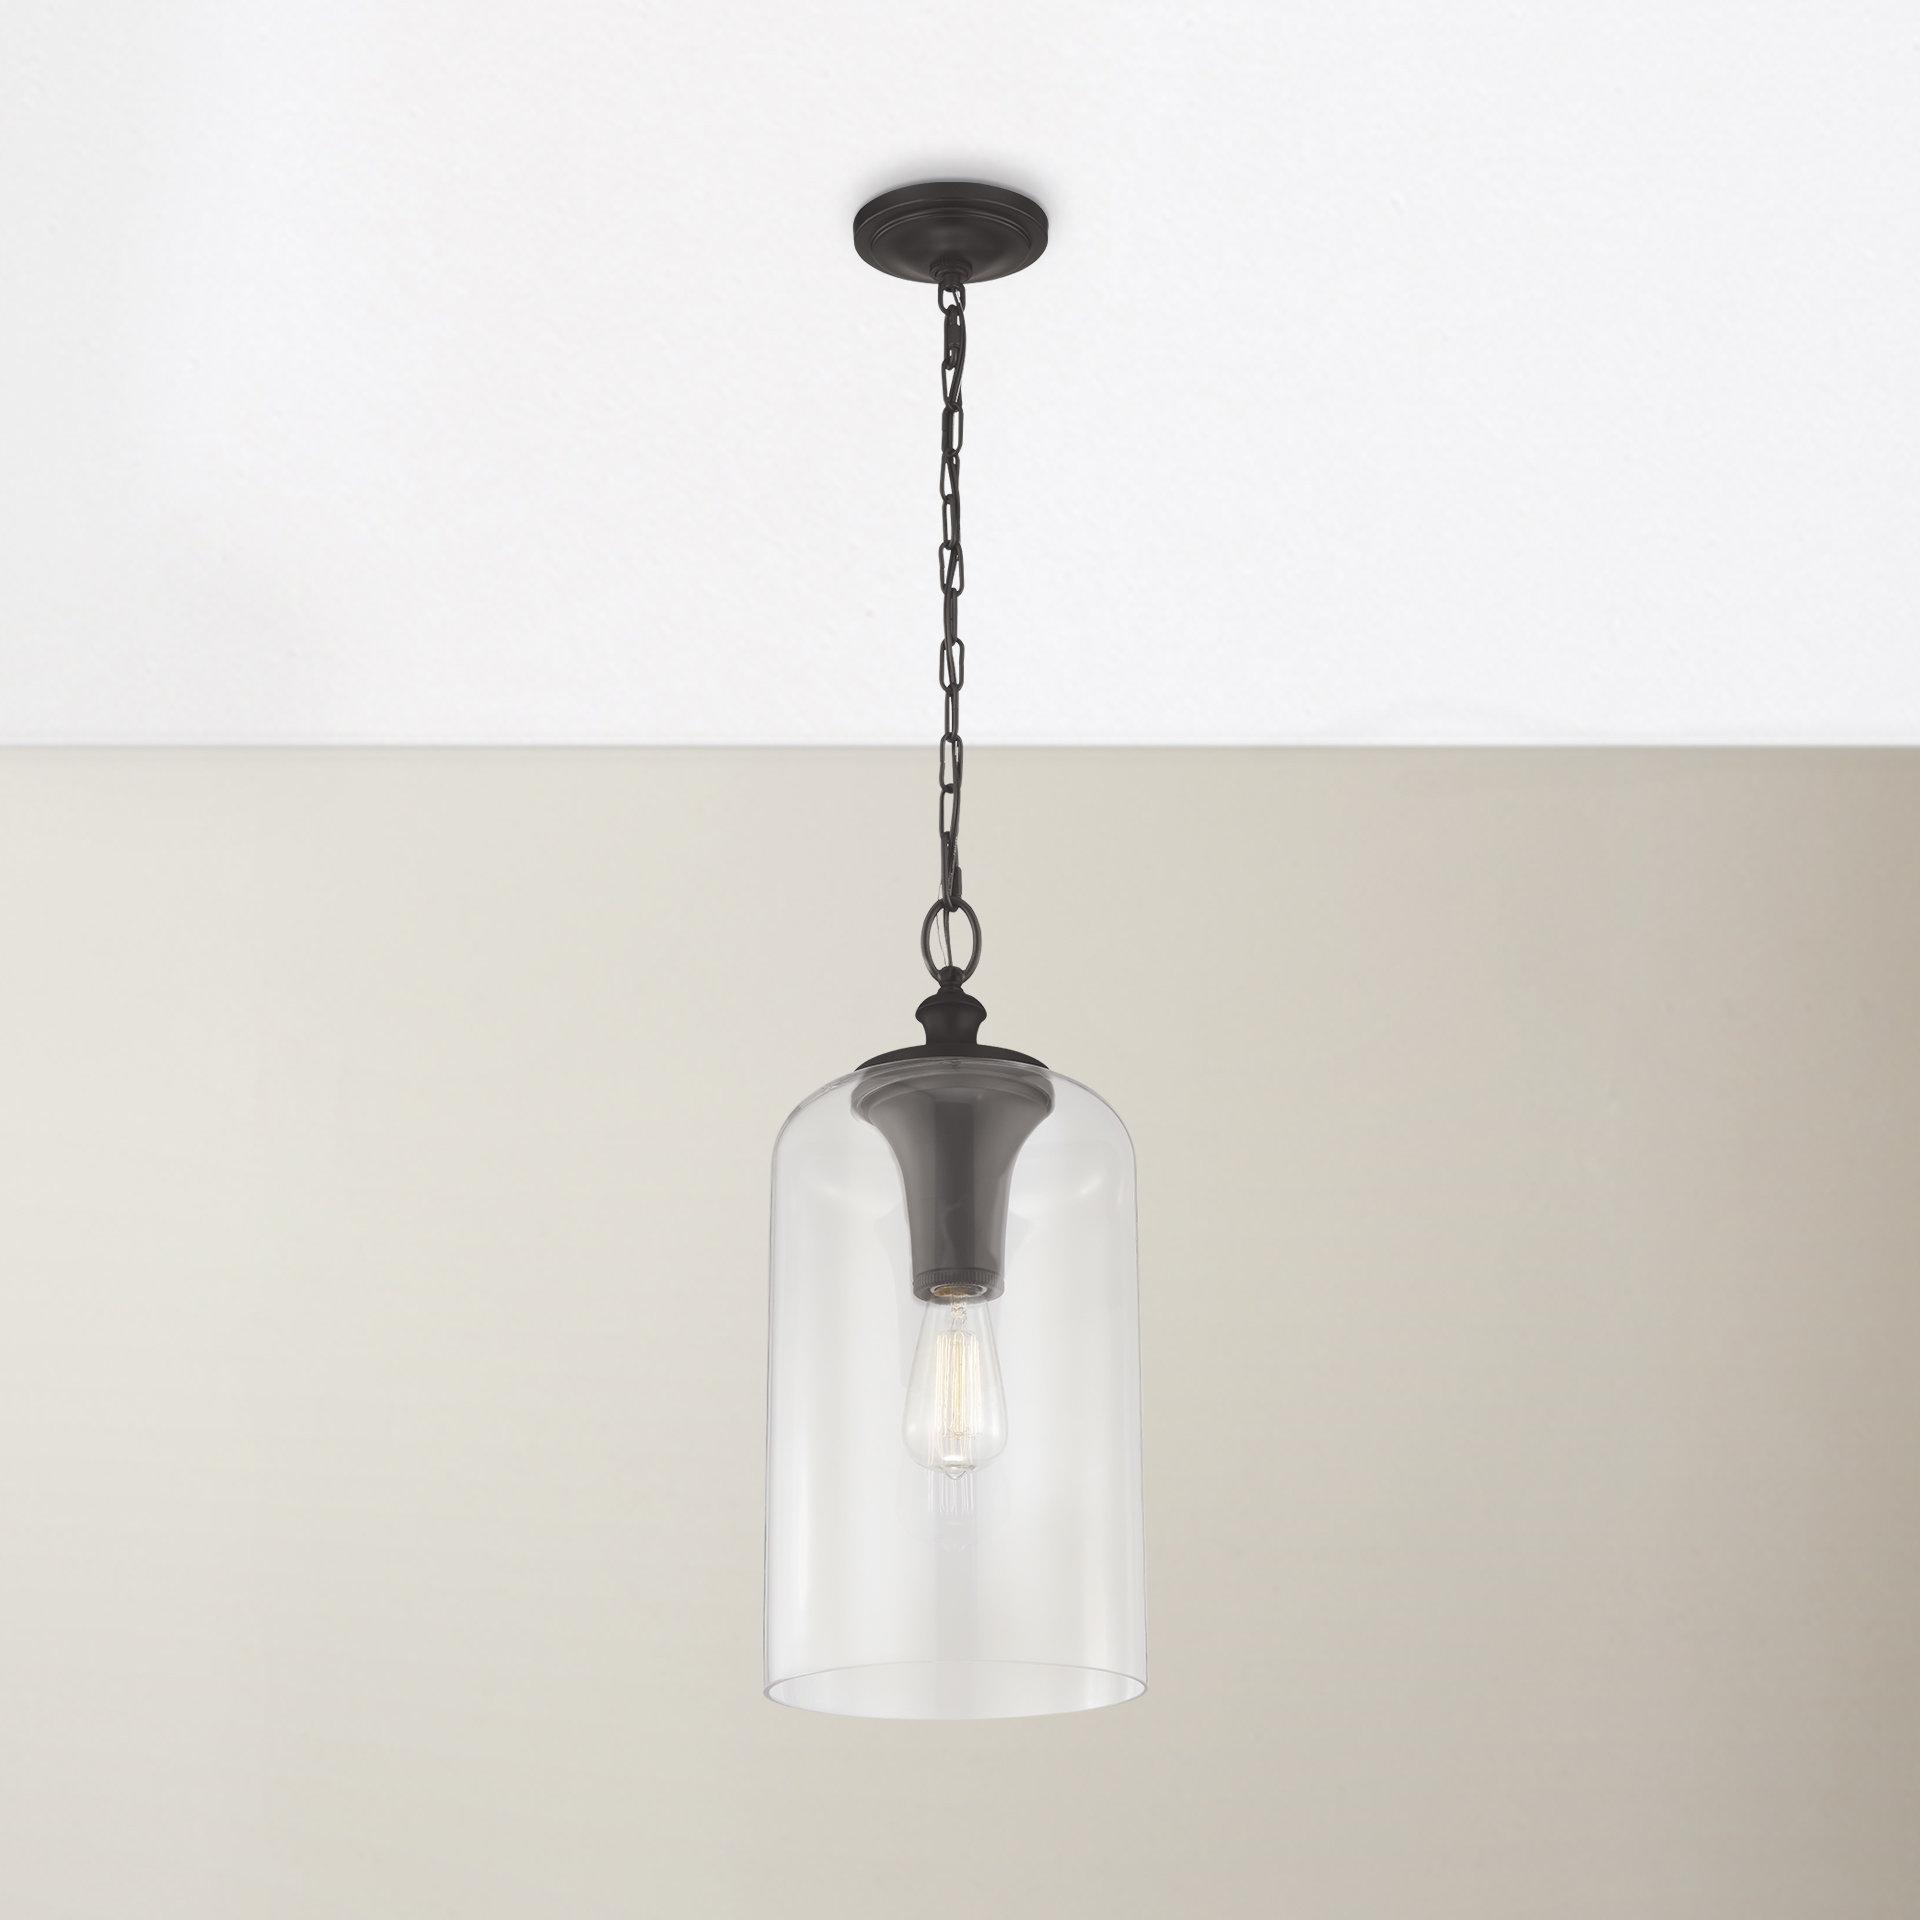 Nolan 1 Light Single Cylinder Pendant Regarding Well Liked Nolan 1 Light Lantern Chandeliers (View 4 of 25)